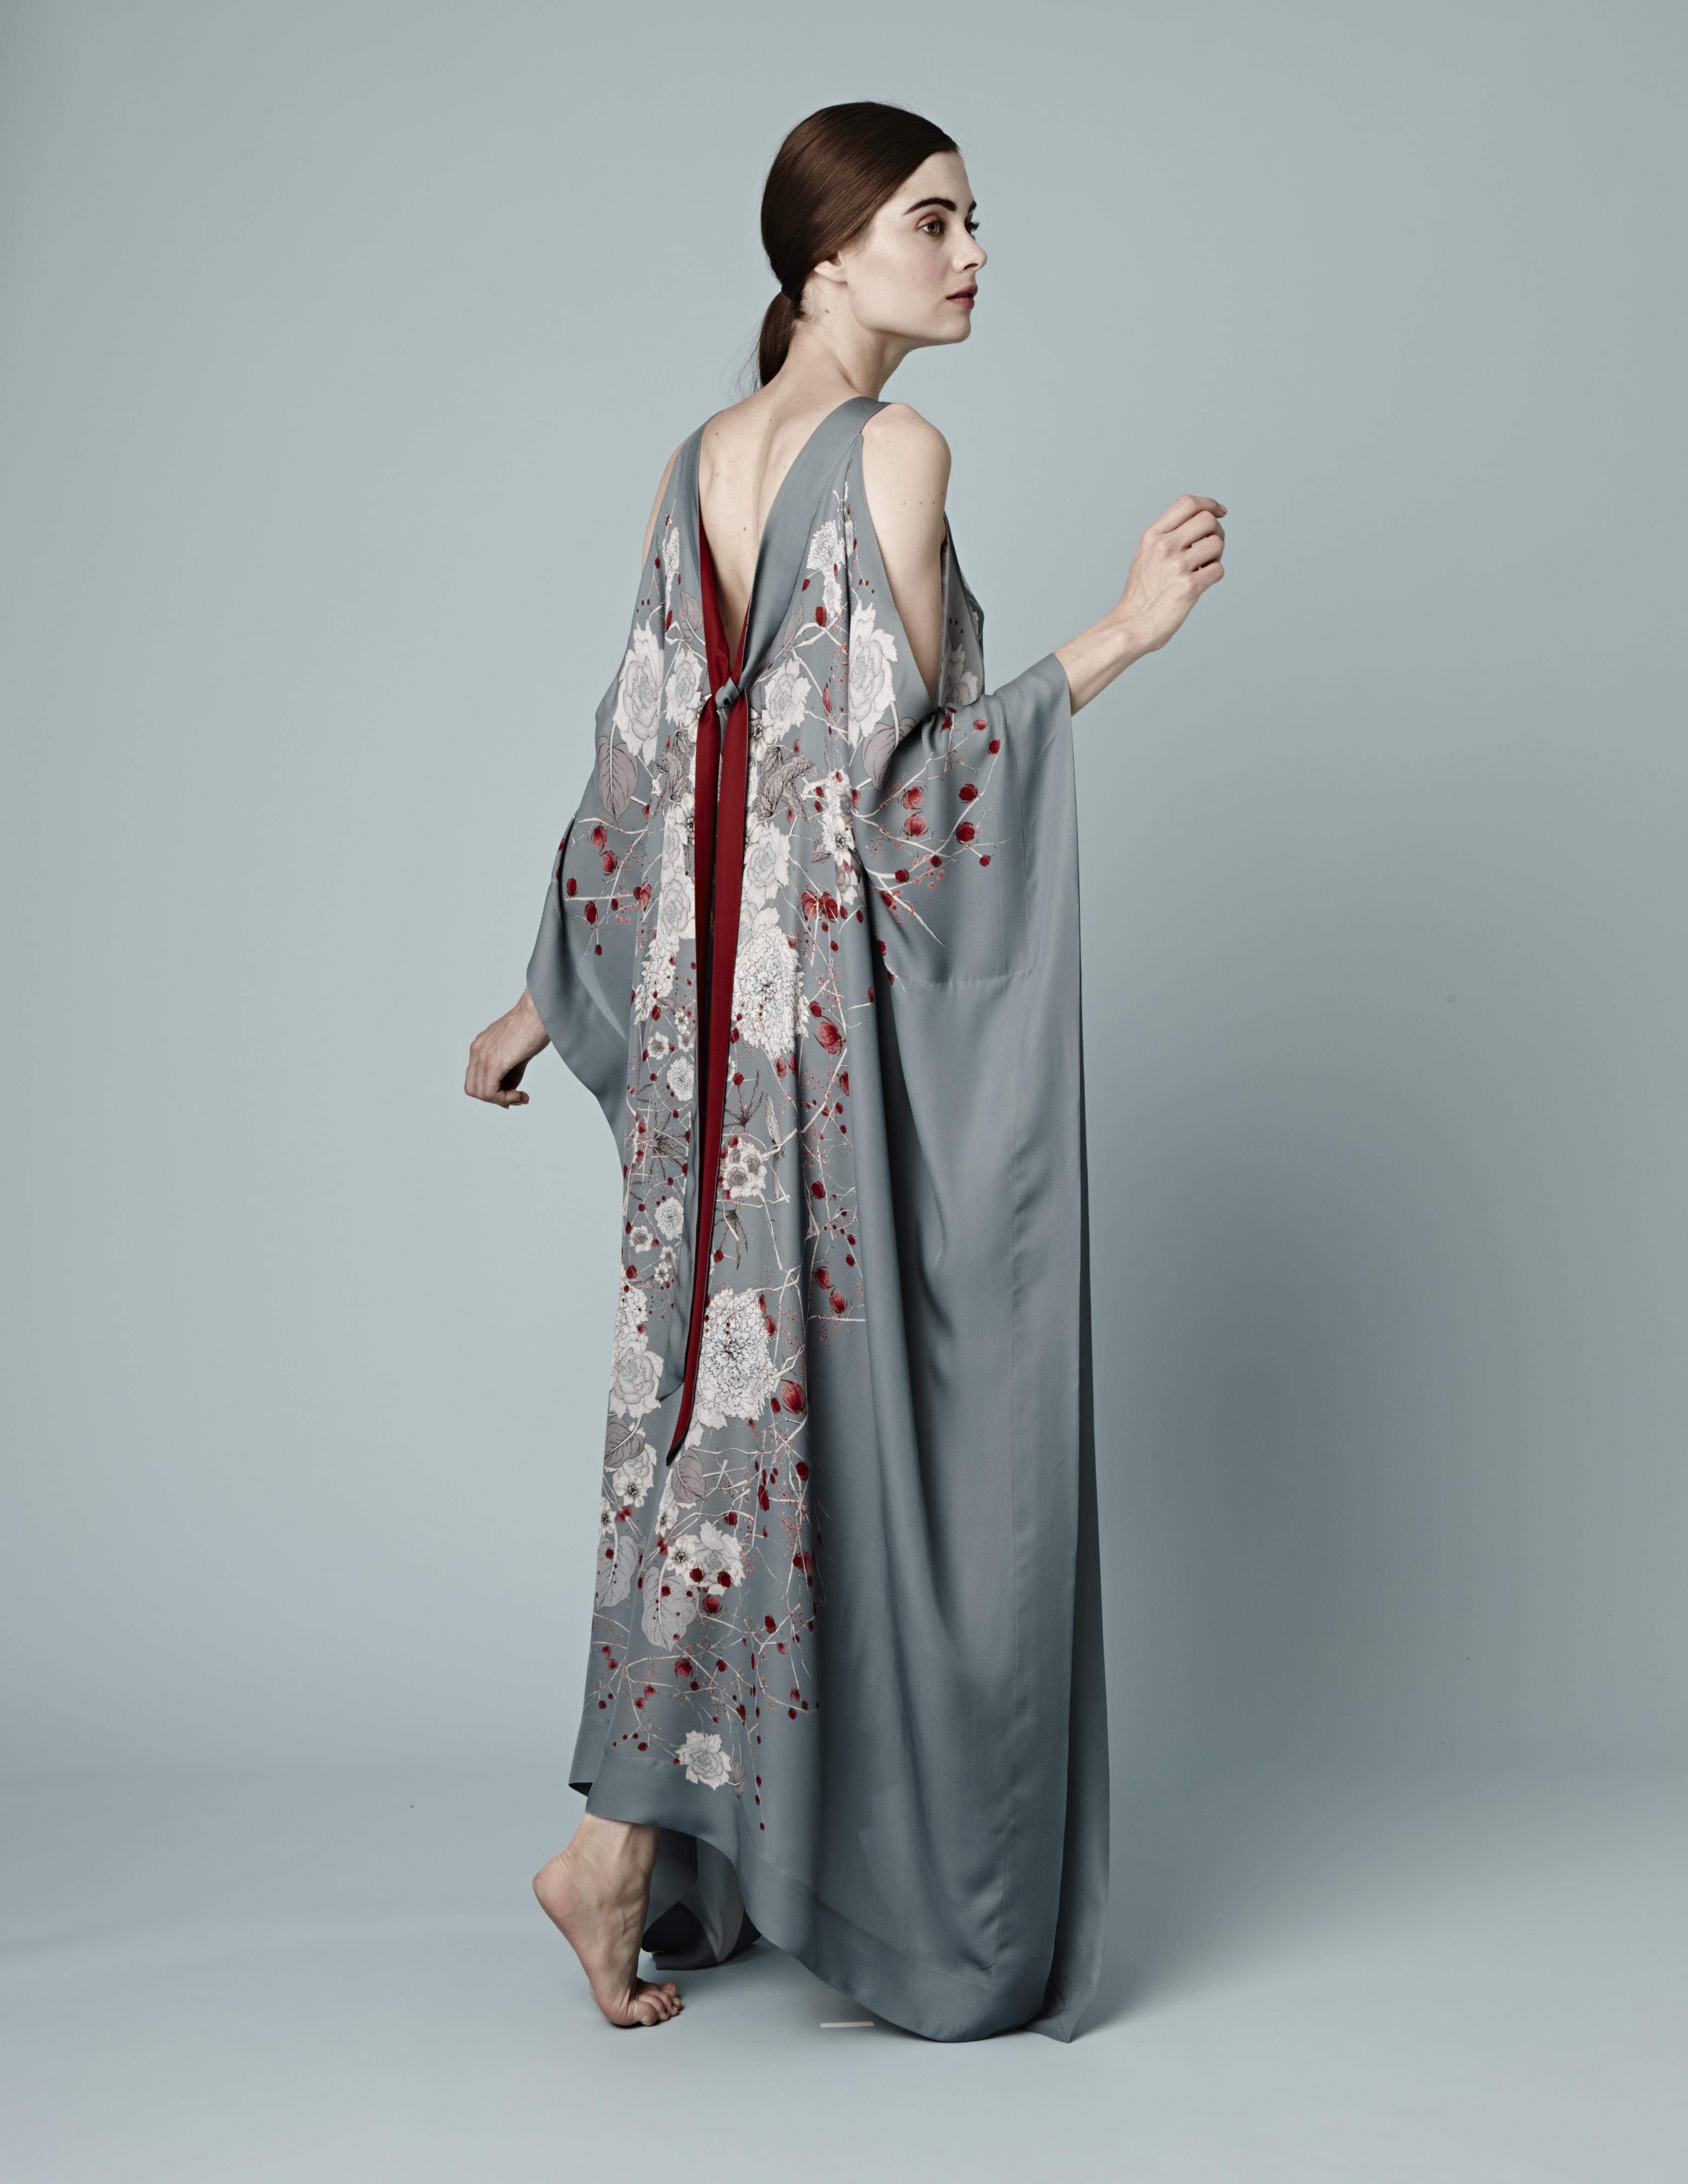 meng-mode-luxe-loungewear-mode-a-porter-a-la-maison